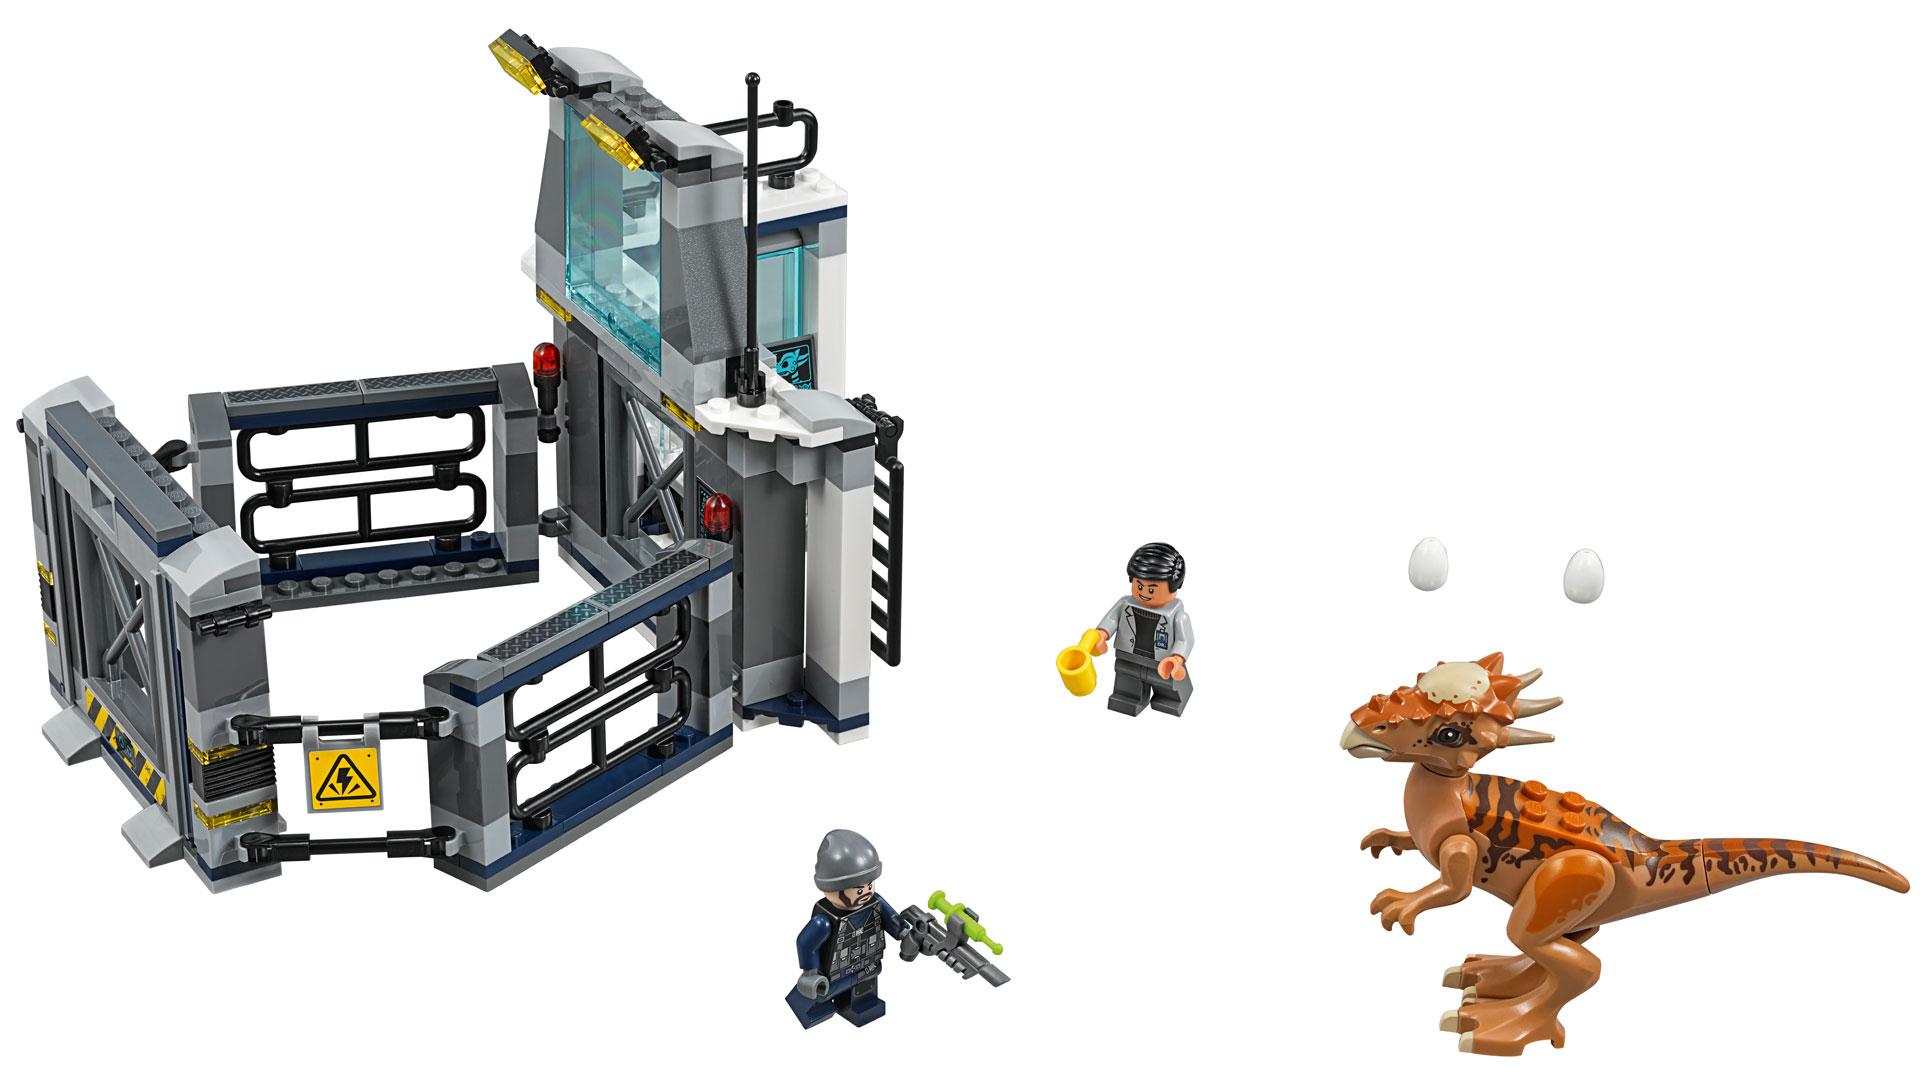 LEGO Jurassic World Set 75927 Stygimoloch Breakout at Toy Fair 2018